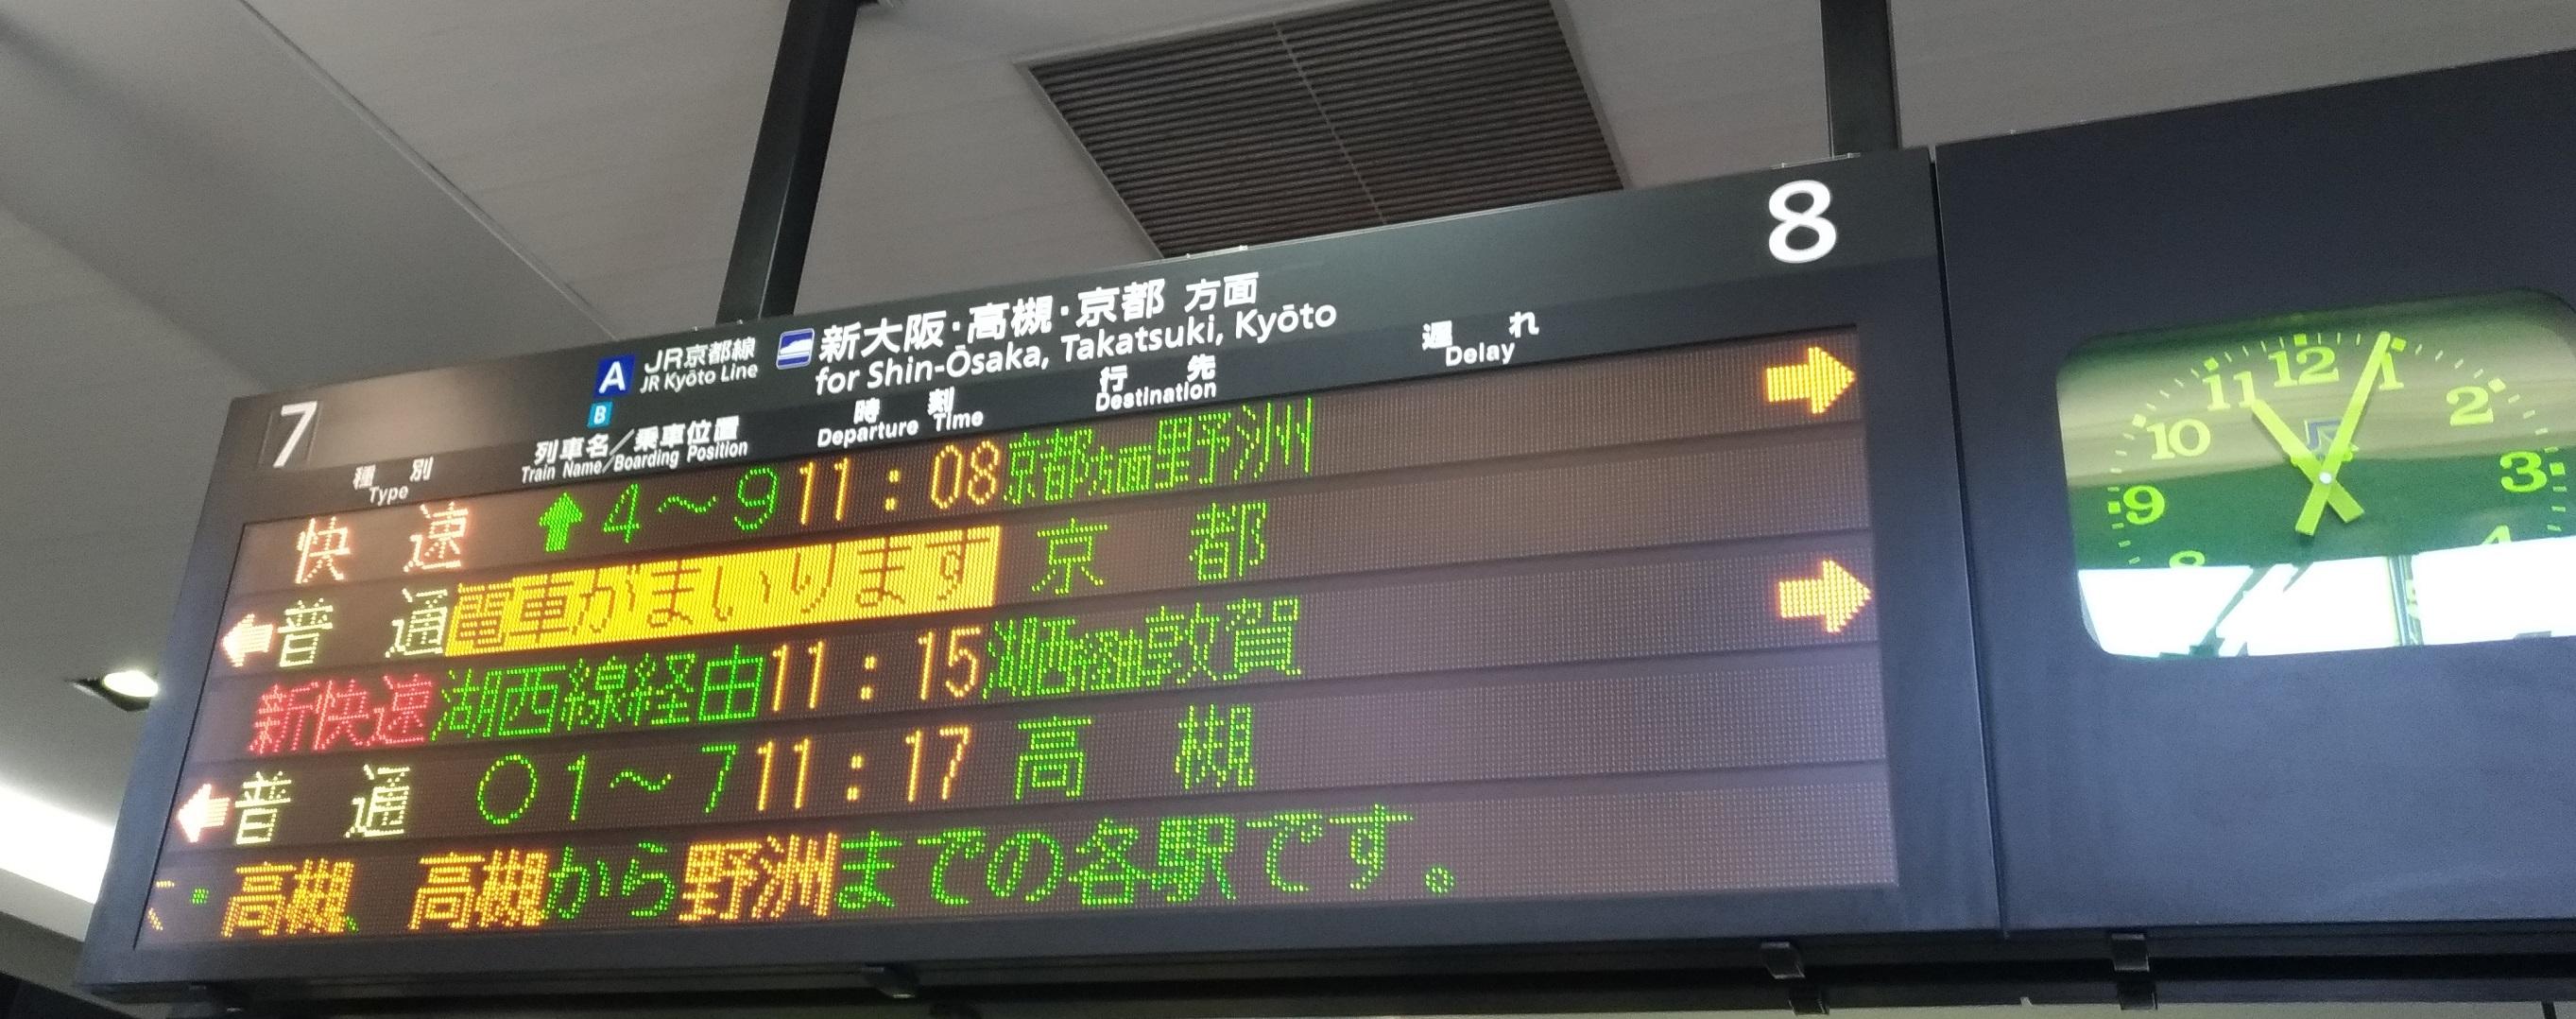 shin_osaka_umeda_train_.jpg